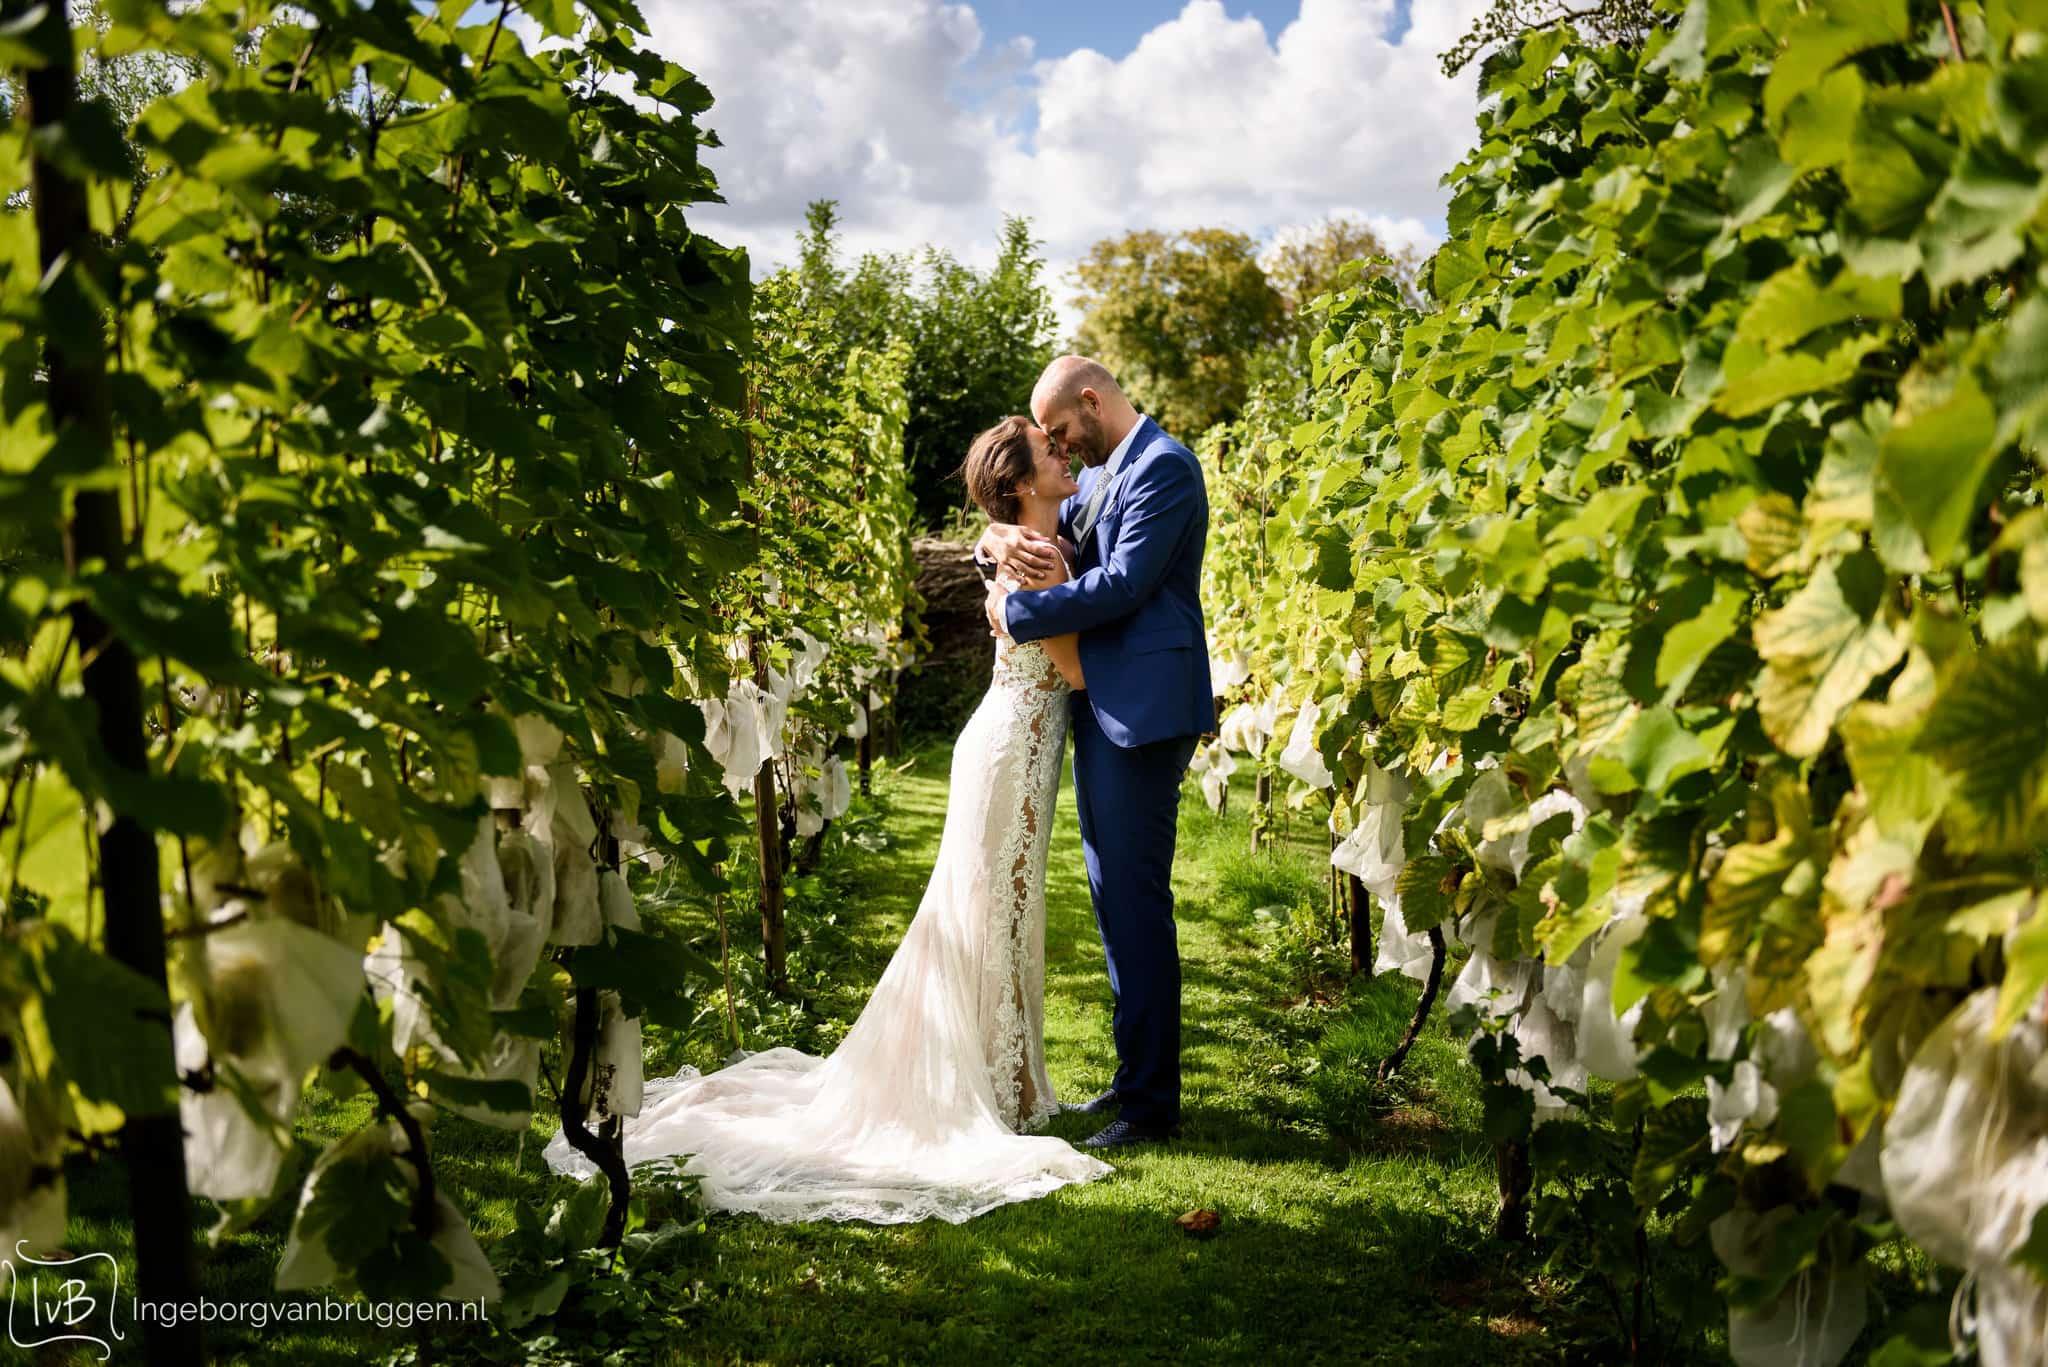 Hoe je het mooist op je trouwfoto's komt te staan